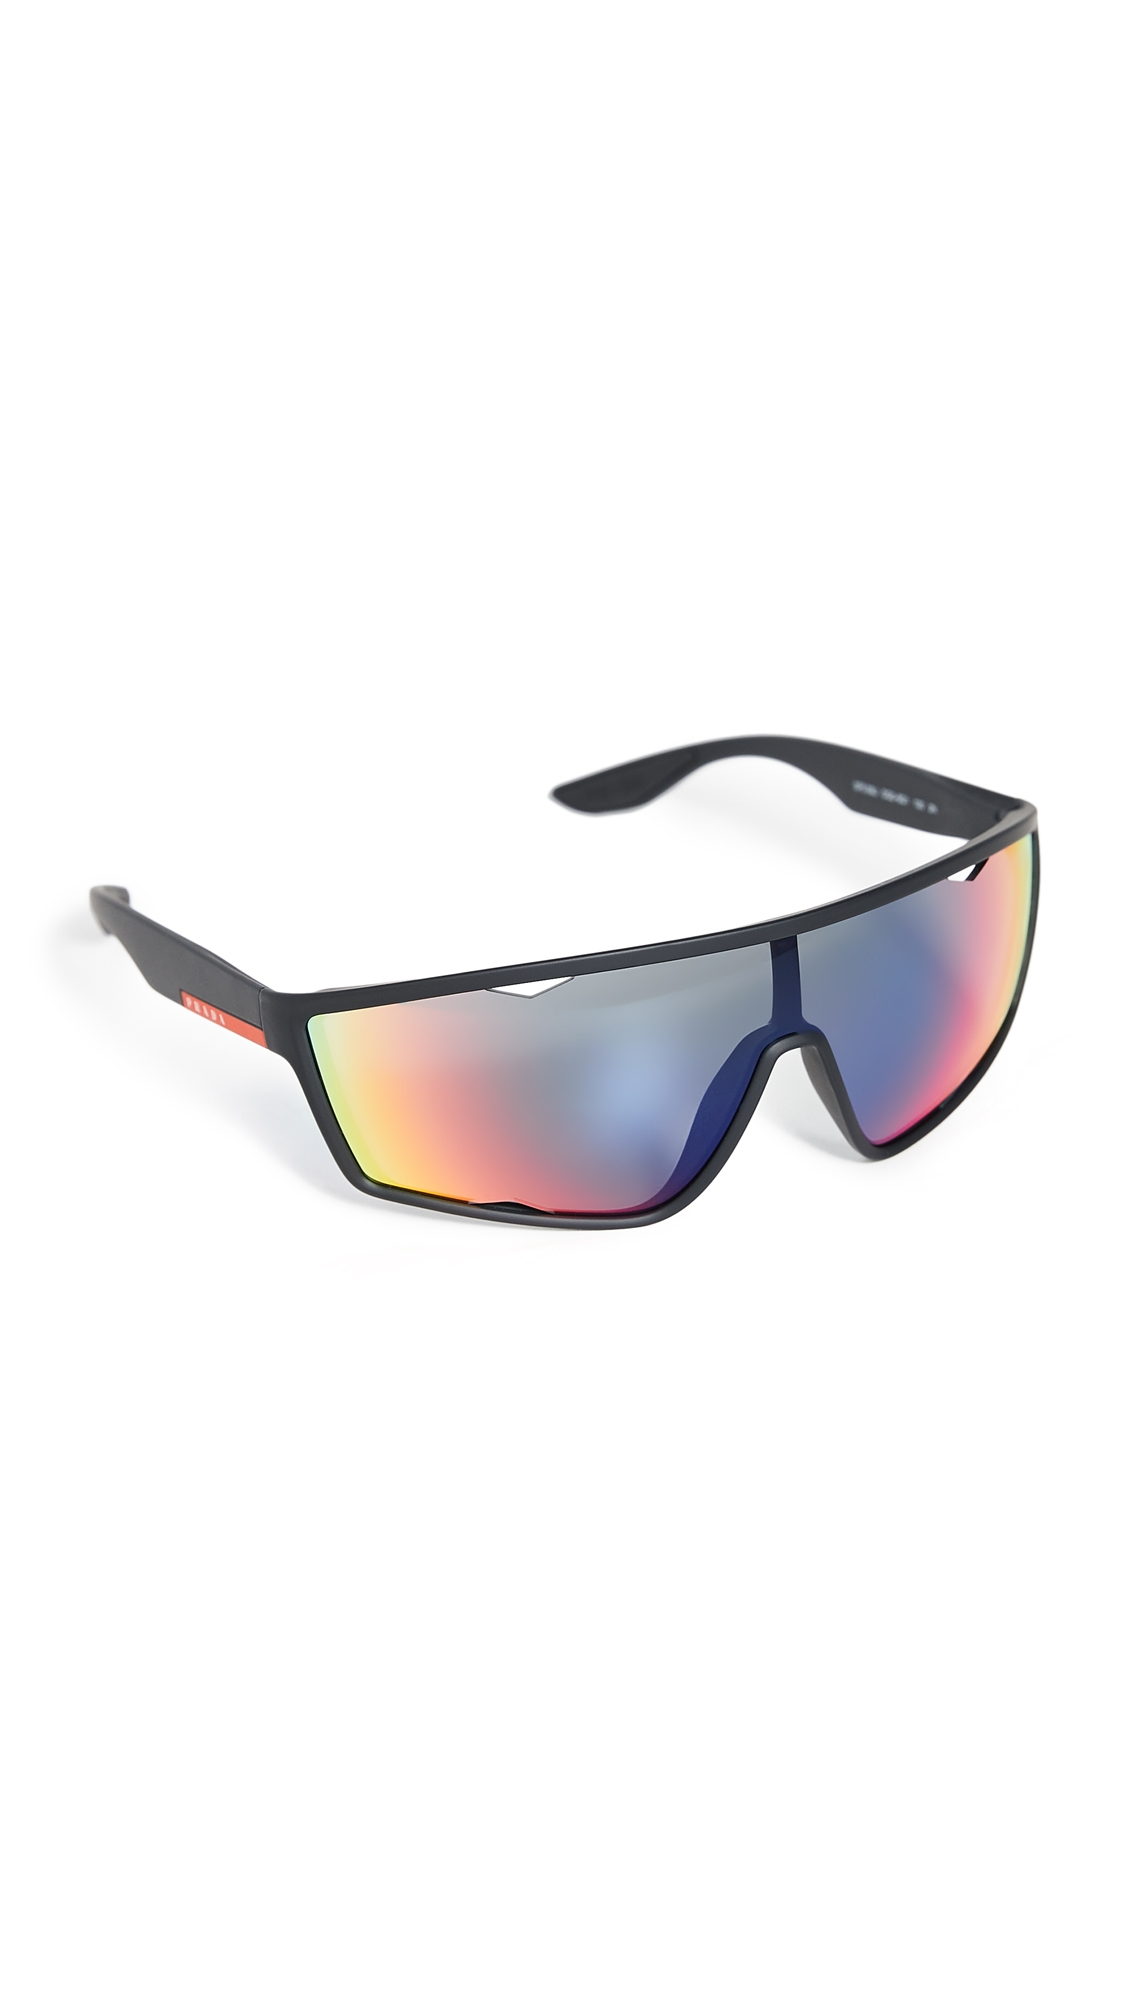 Prada Sunglasses 0PS 09US SUNGLASSES